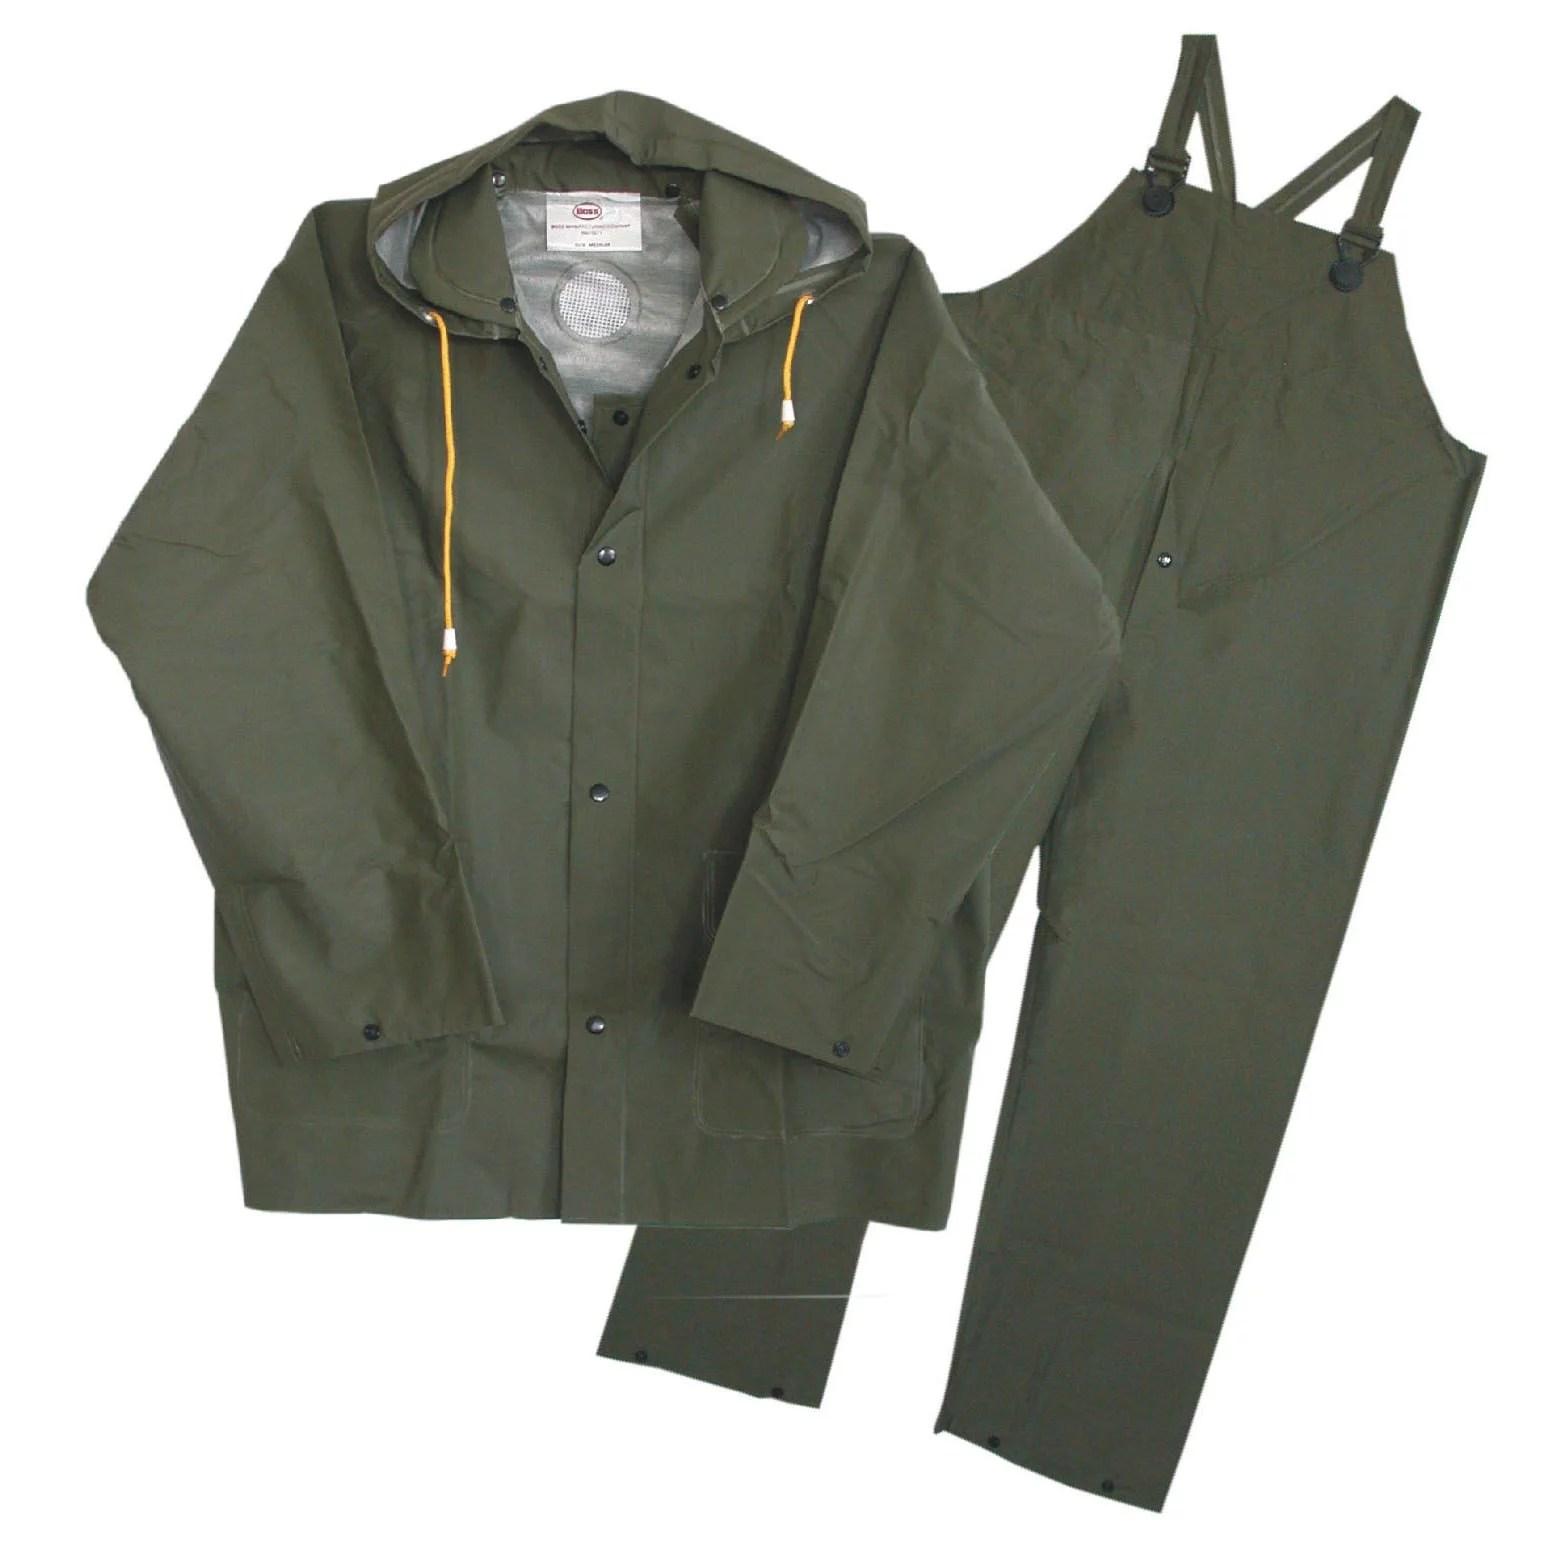 boss gloves 3 piece green lined rain suits